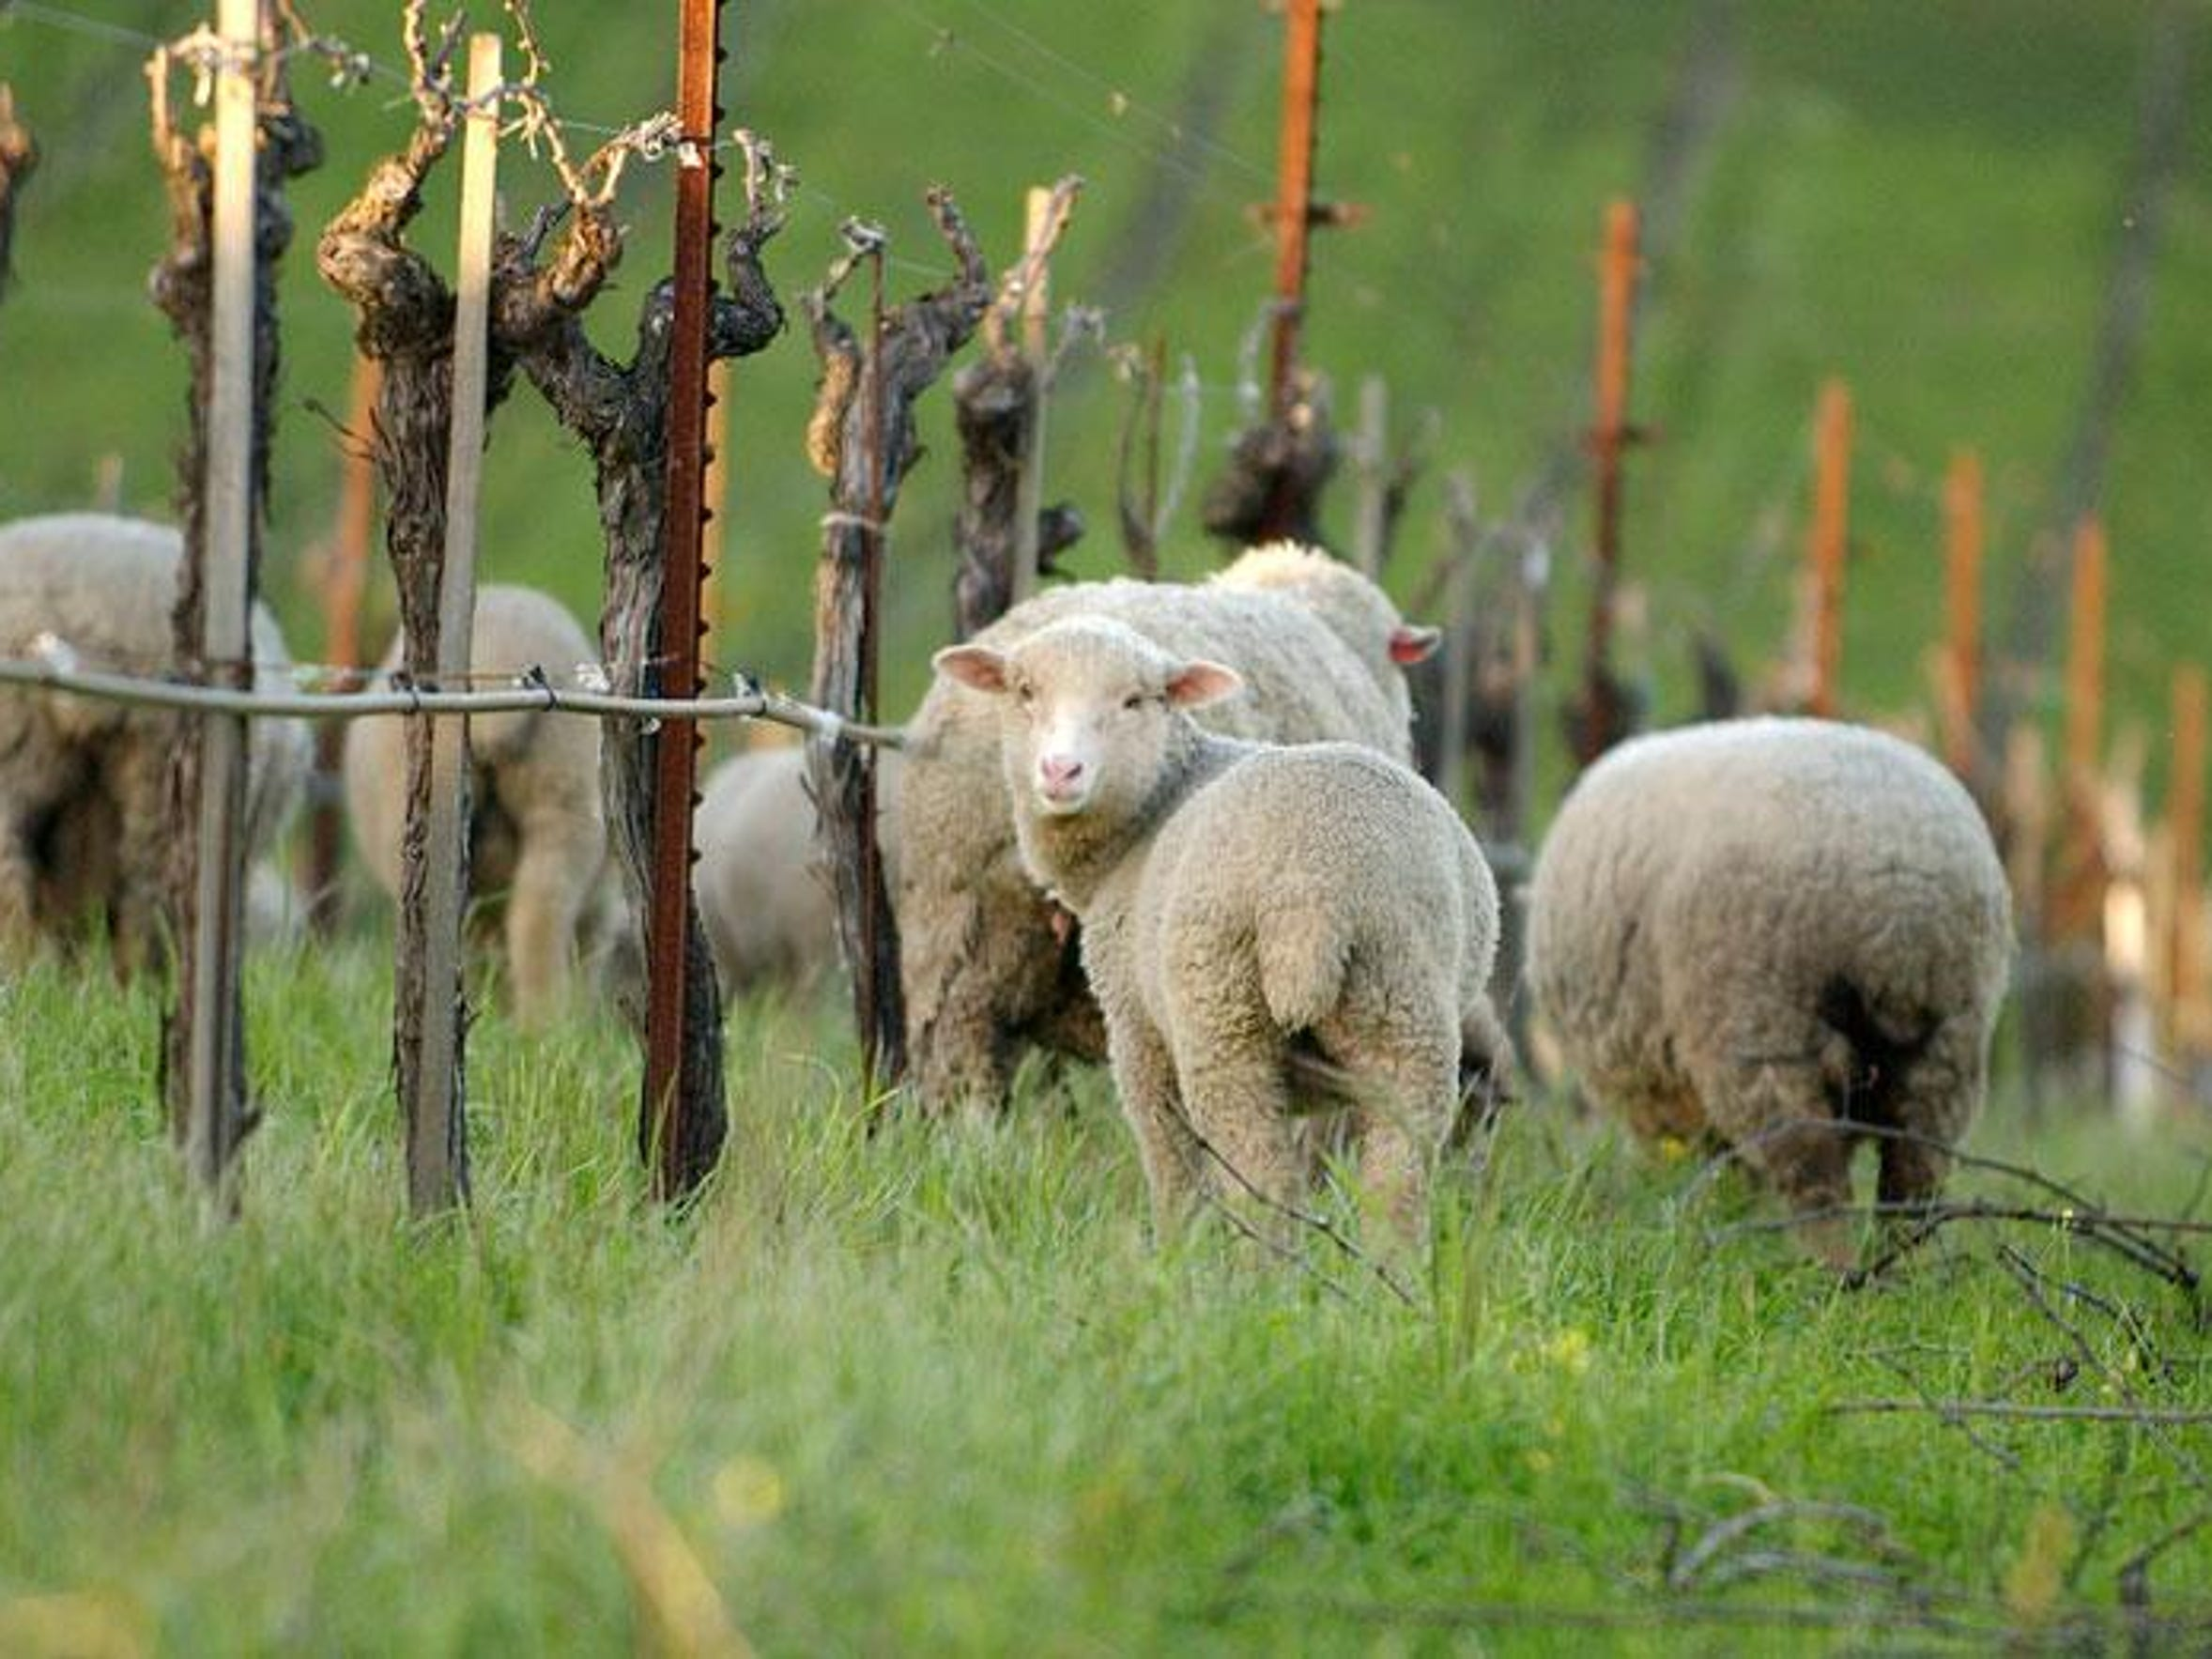 Winter wine 2012 lambs at Robert Sinskey